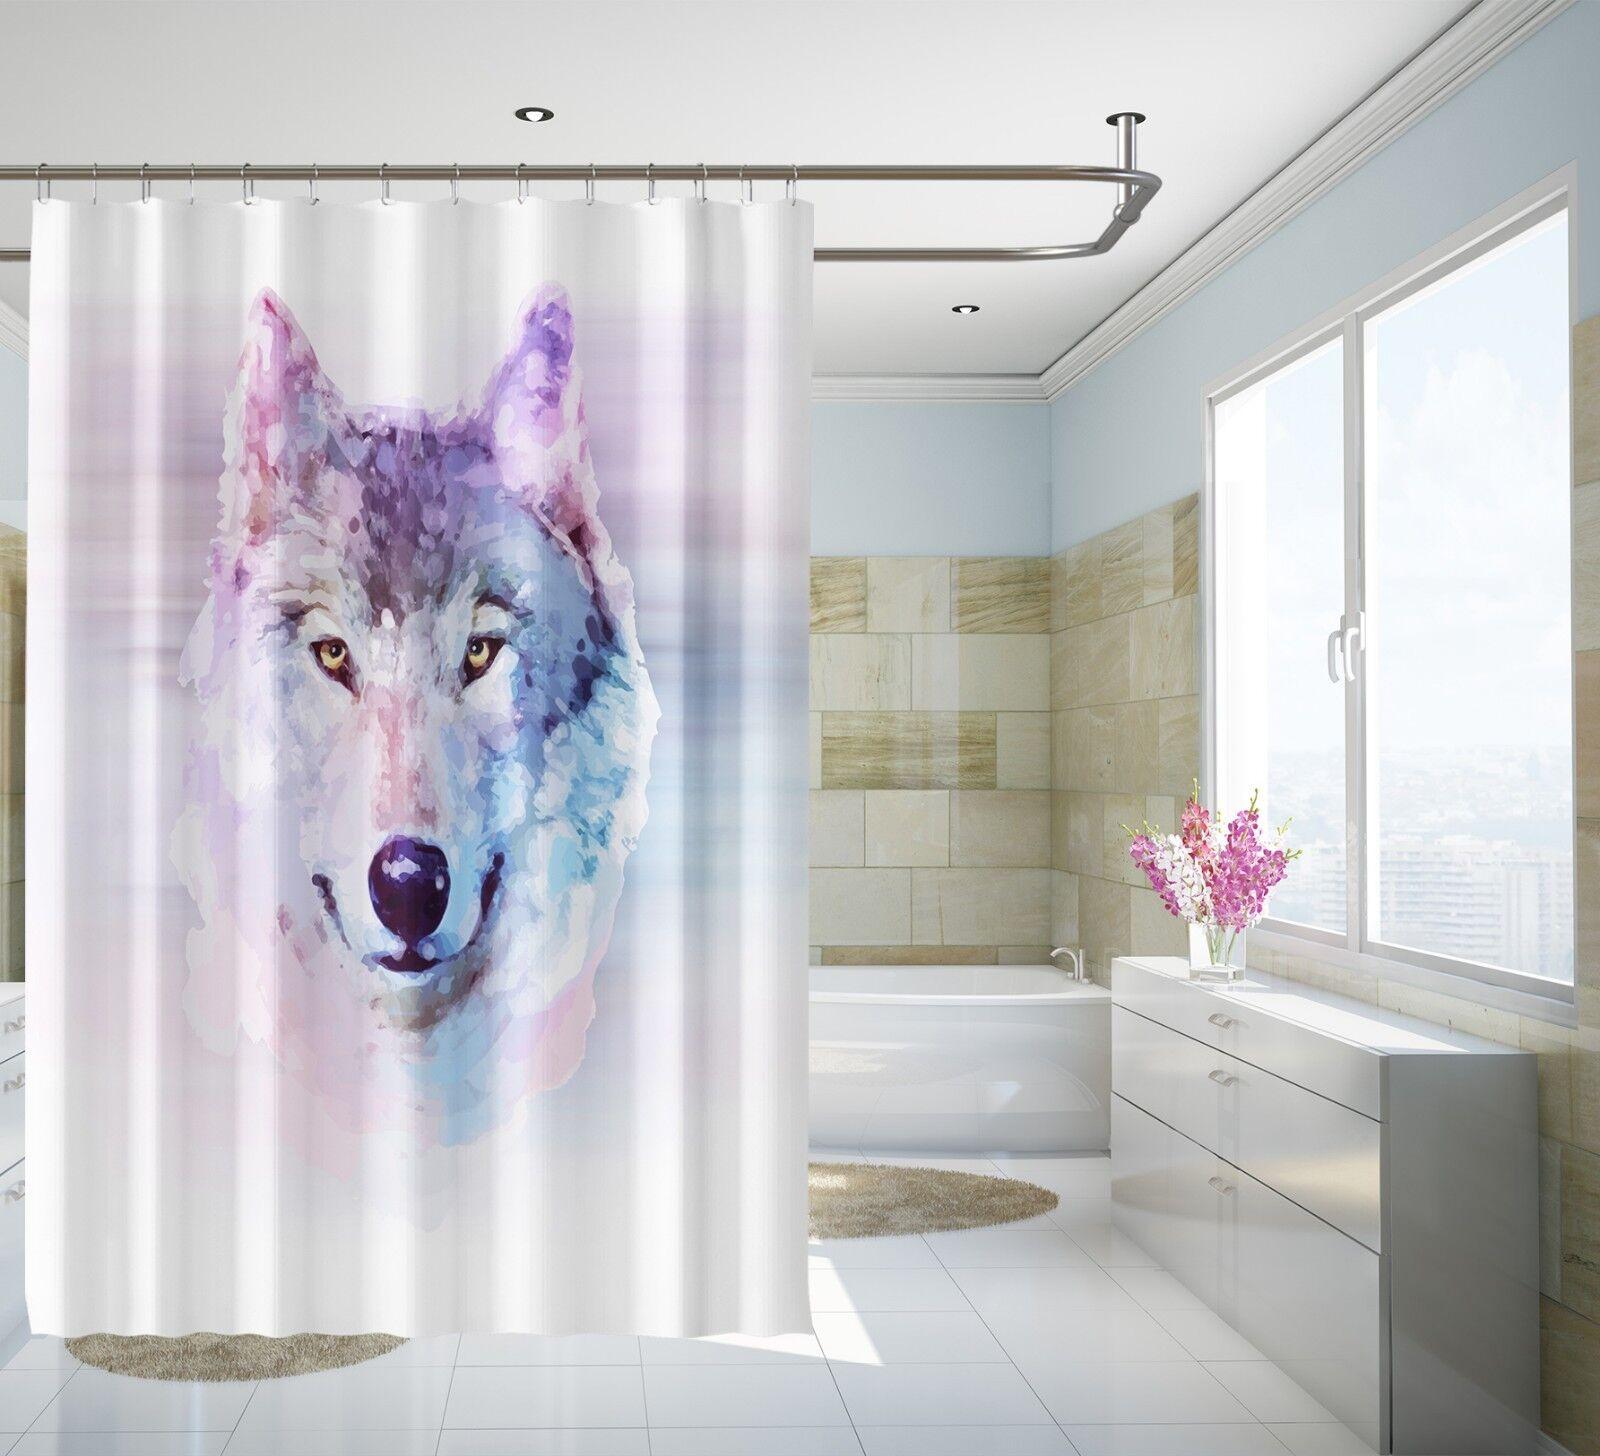 3D Wolf Painting 89 Shower Curtain Waterproof Fiber Bathroom Home Windows Toilet